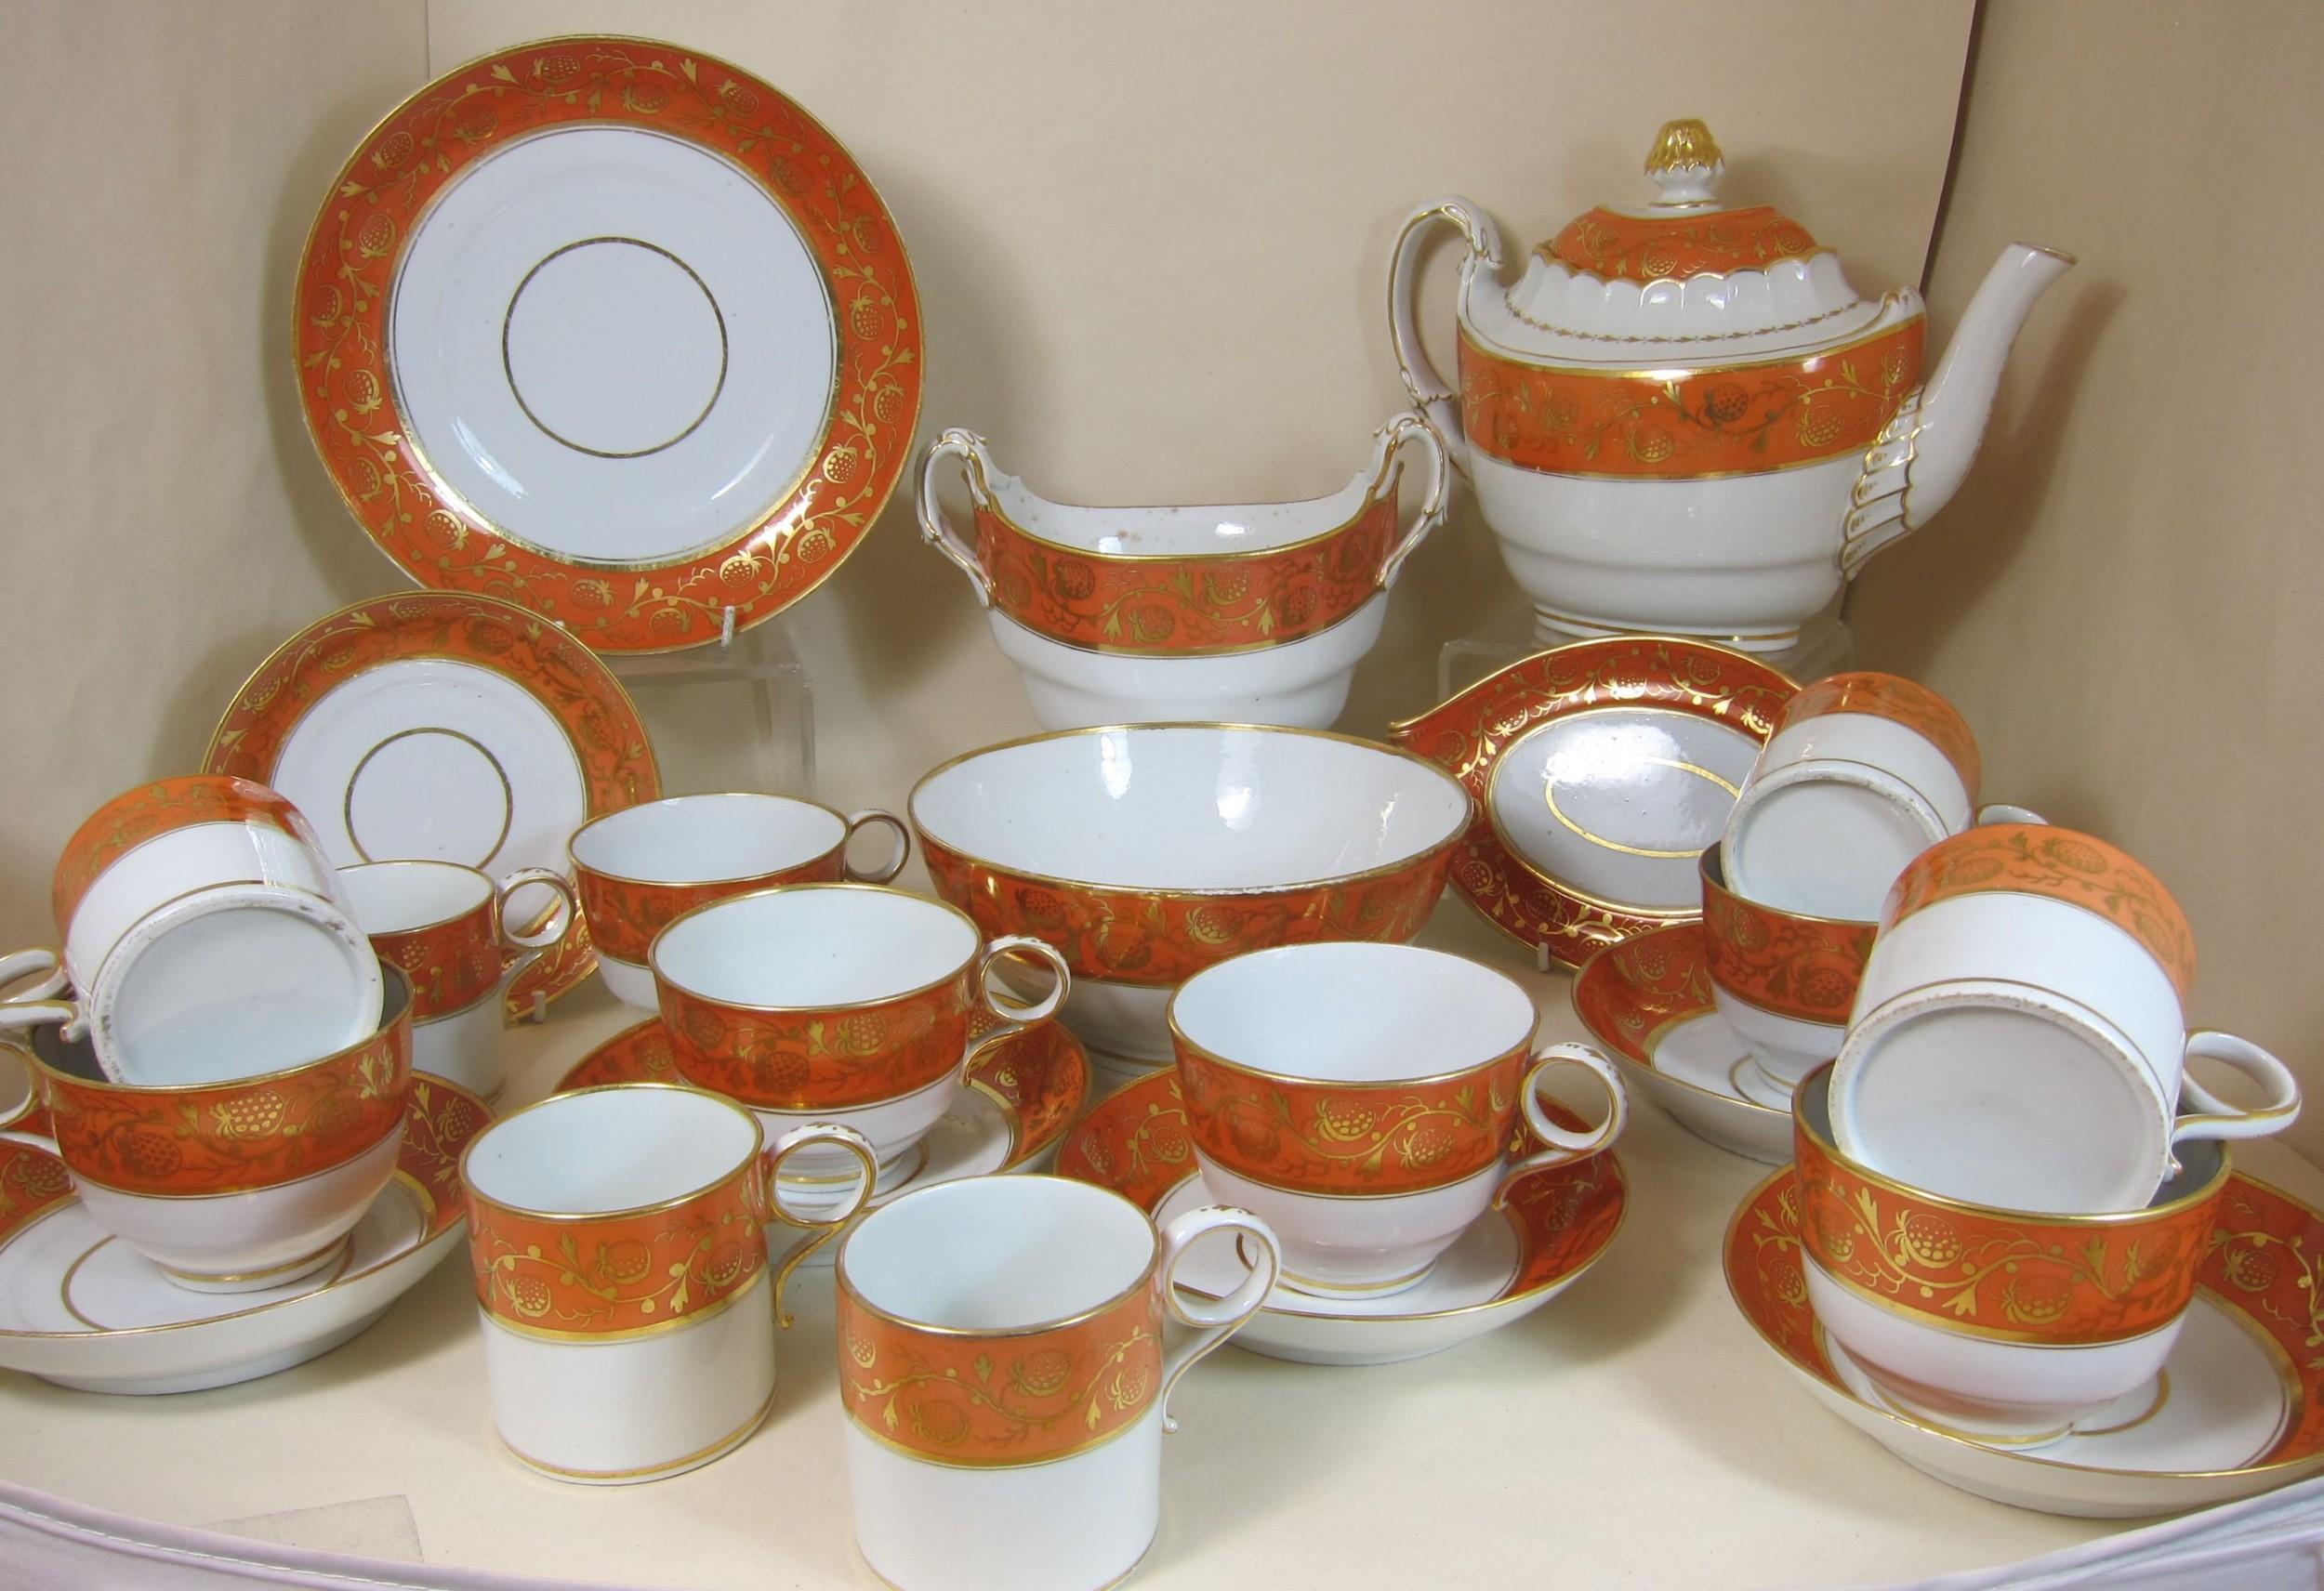 worcester porcelain part tea service with orange band strawberry gilding